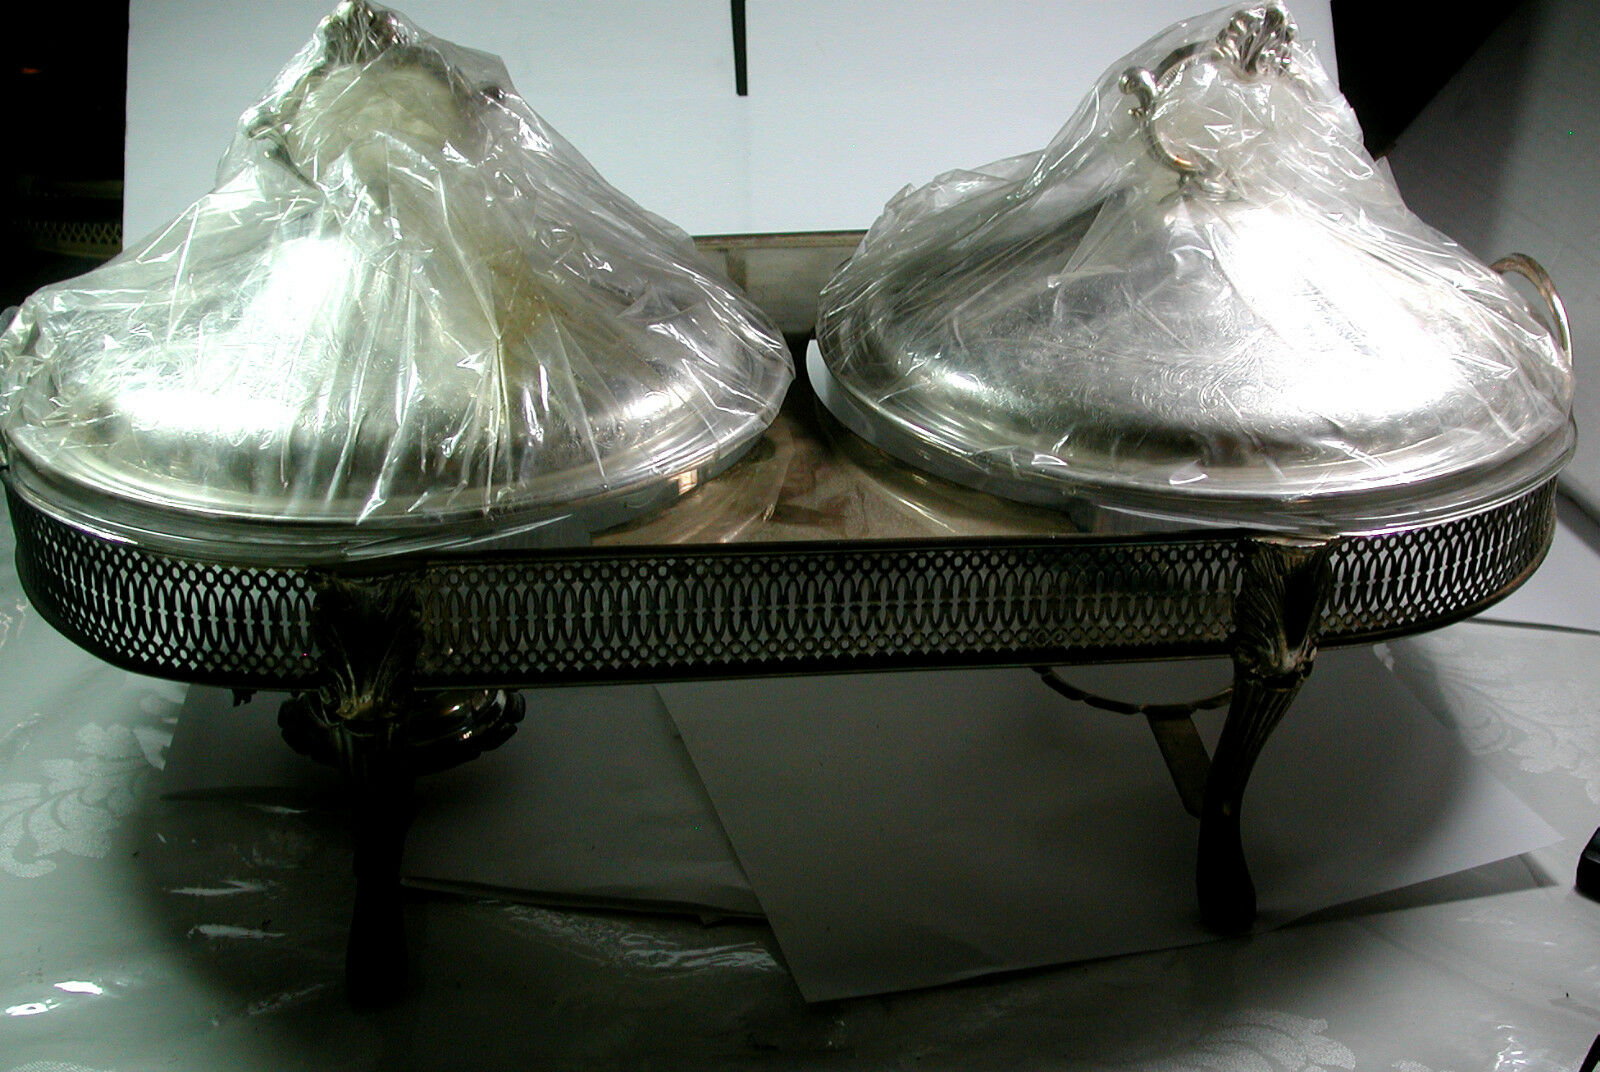 Antique Vintage Filigrane Argent Plaque Large Double Serving Dish Footed Corning